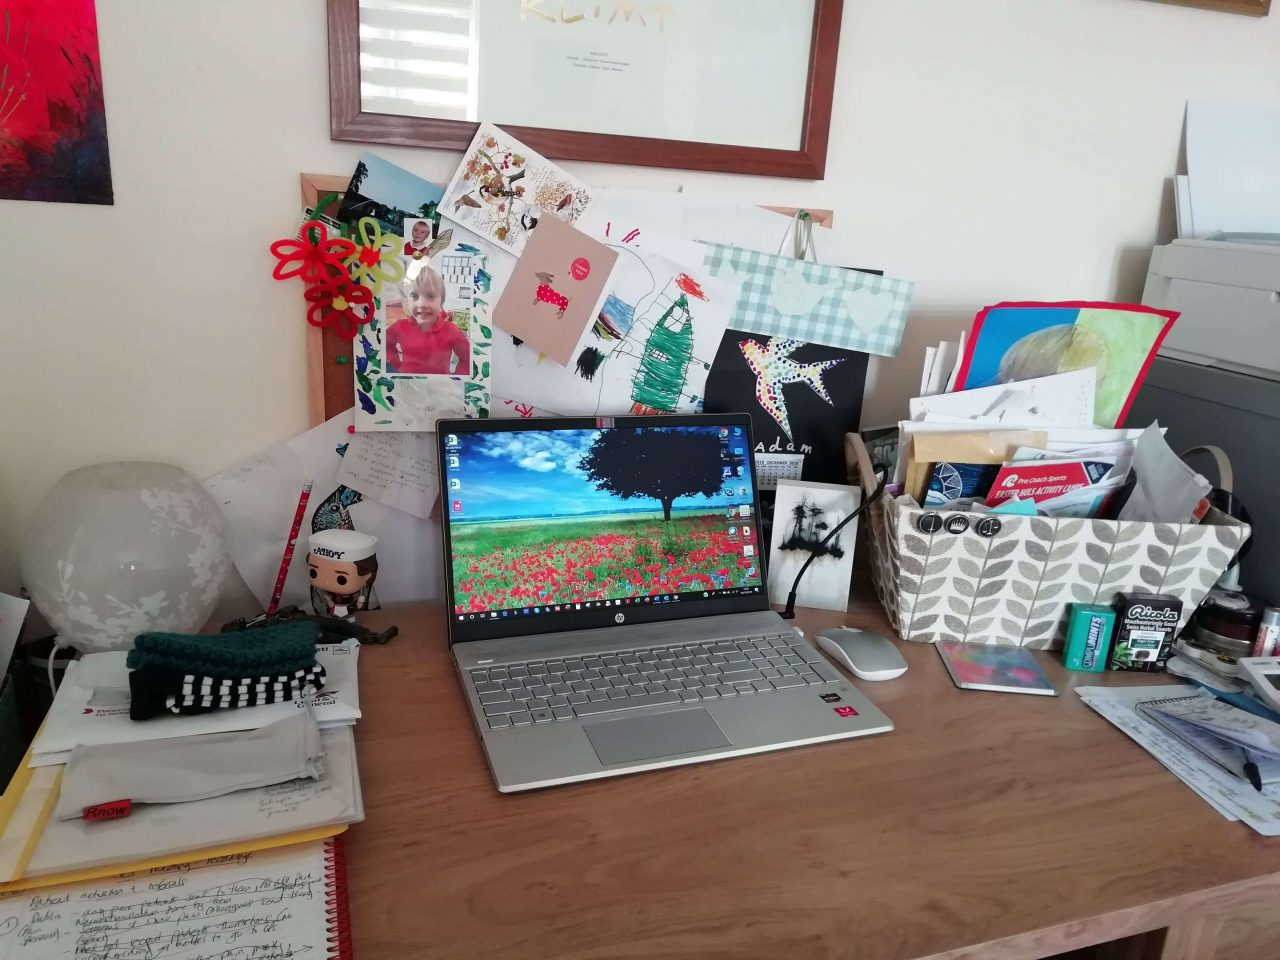 Deborah Nook Desk and Laptop